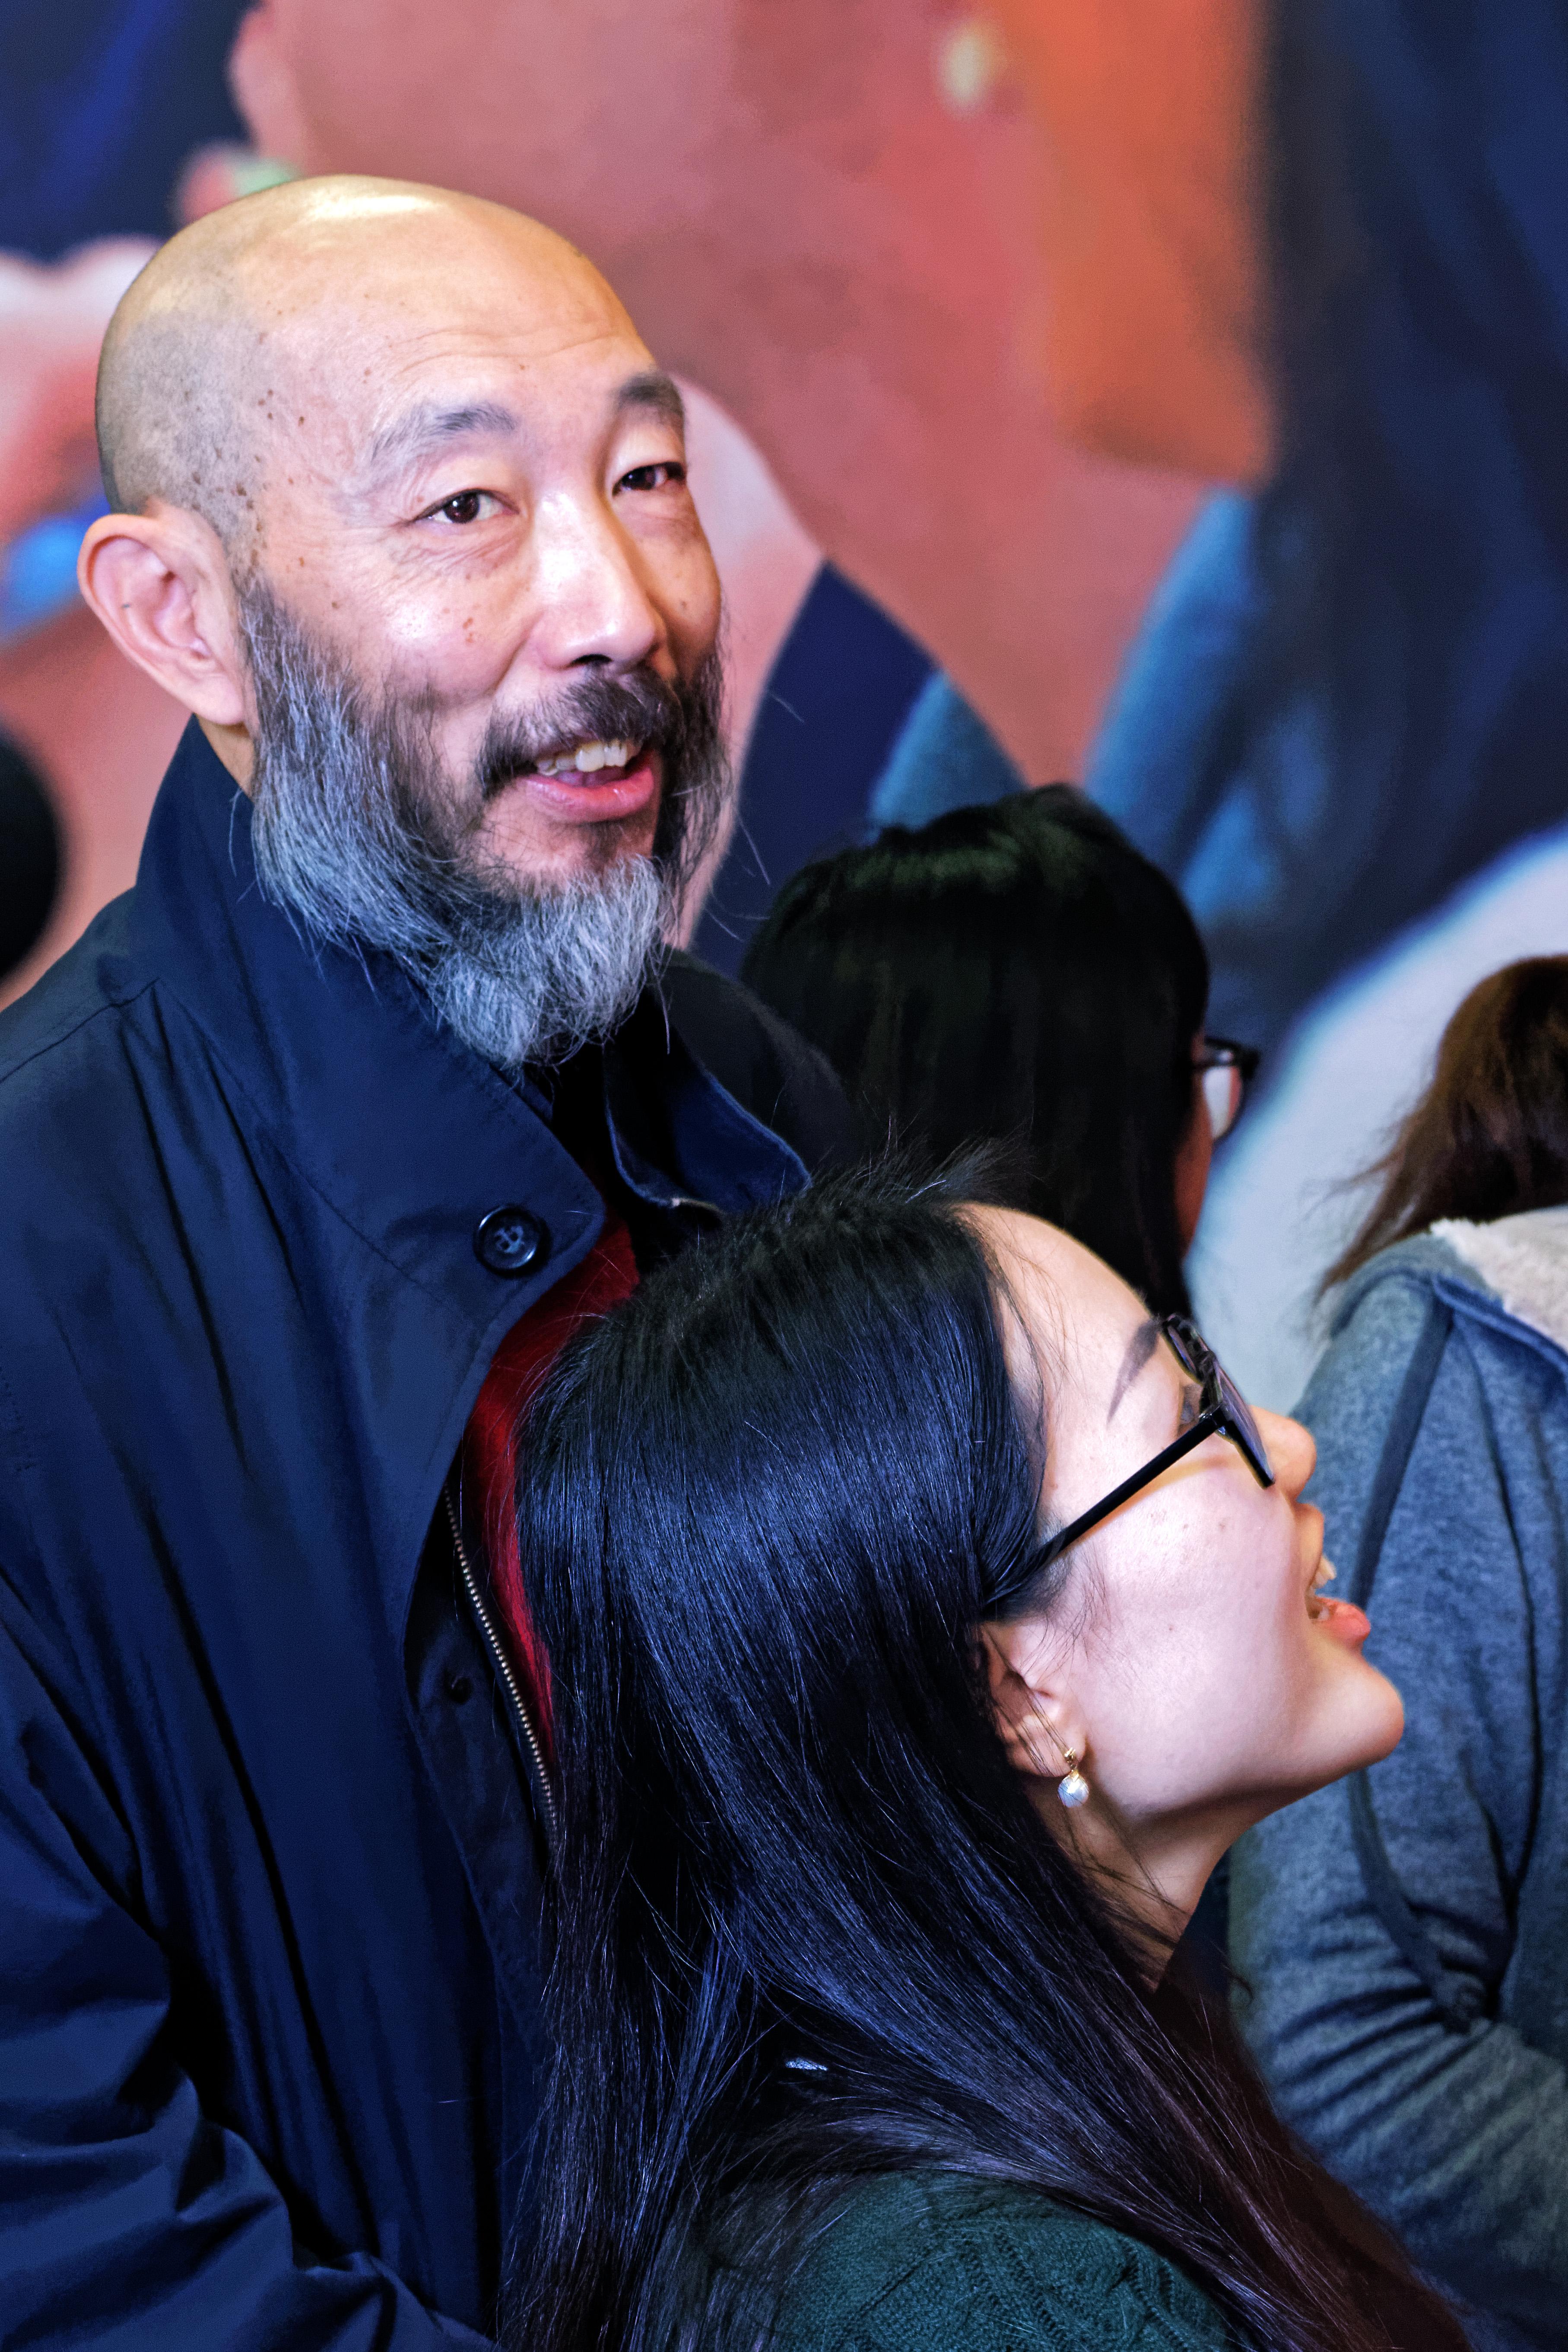 Image of Mo Yi from Wikidata